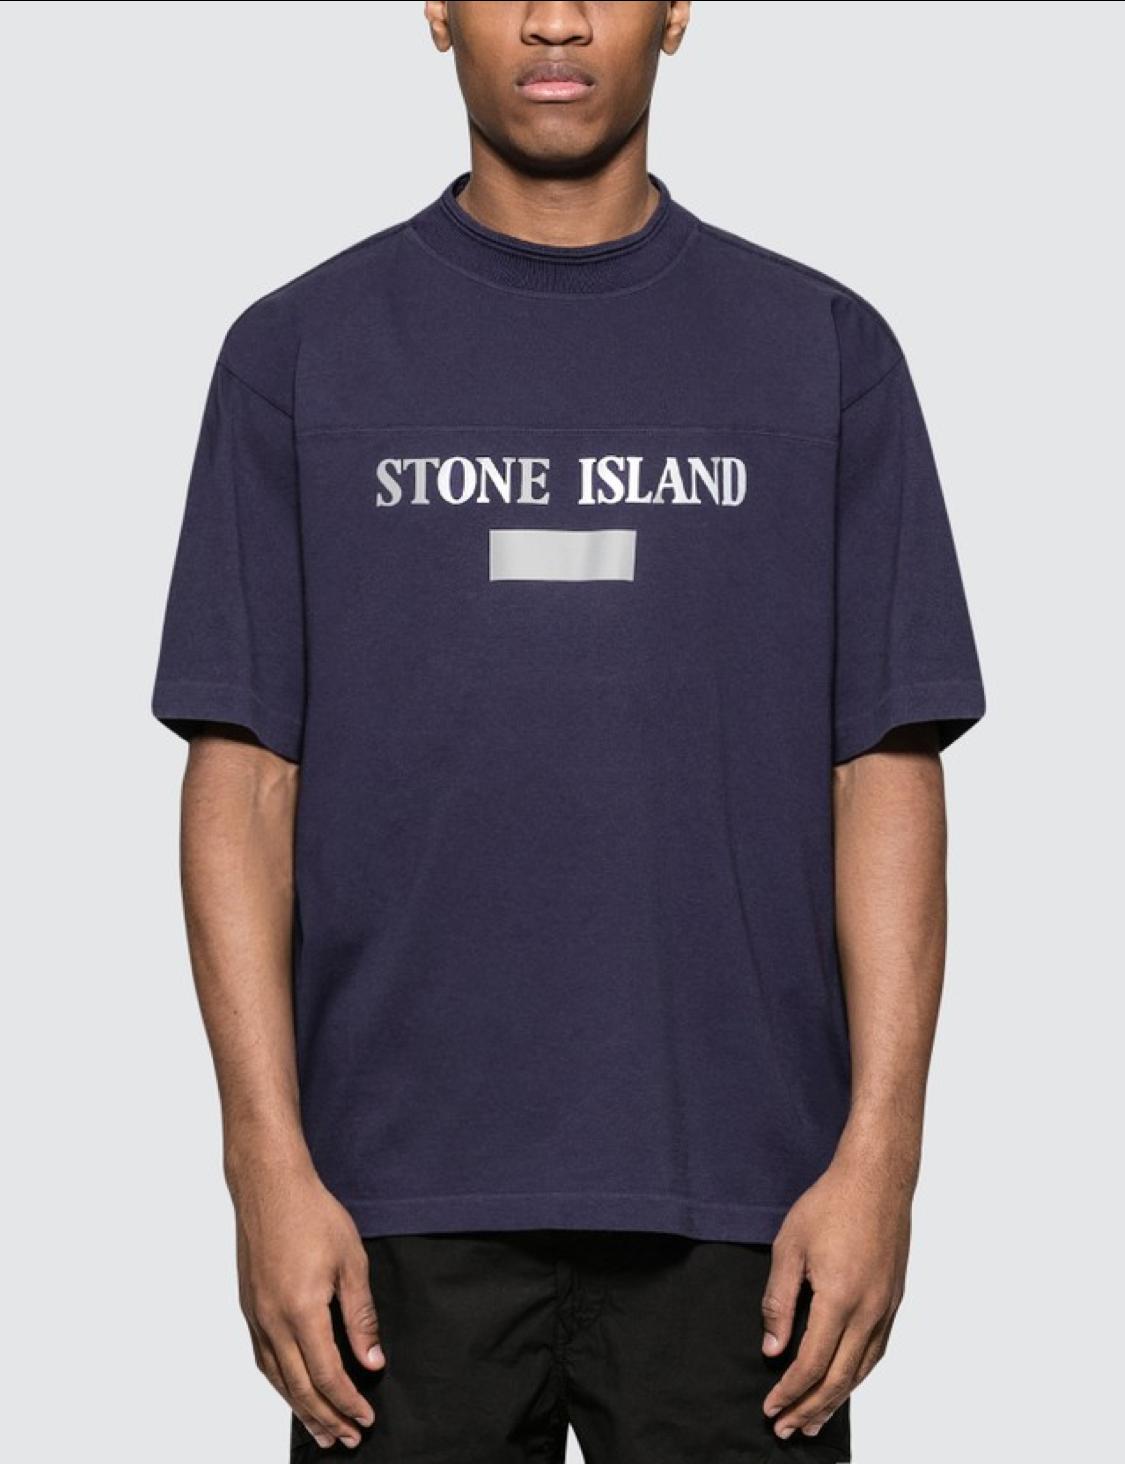 △ STONE ISLAND S/S T-Shirt  HK$871